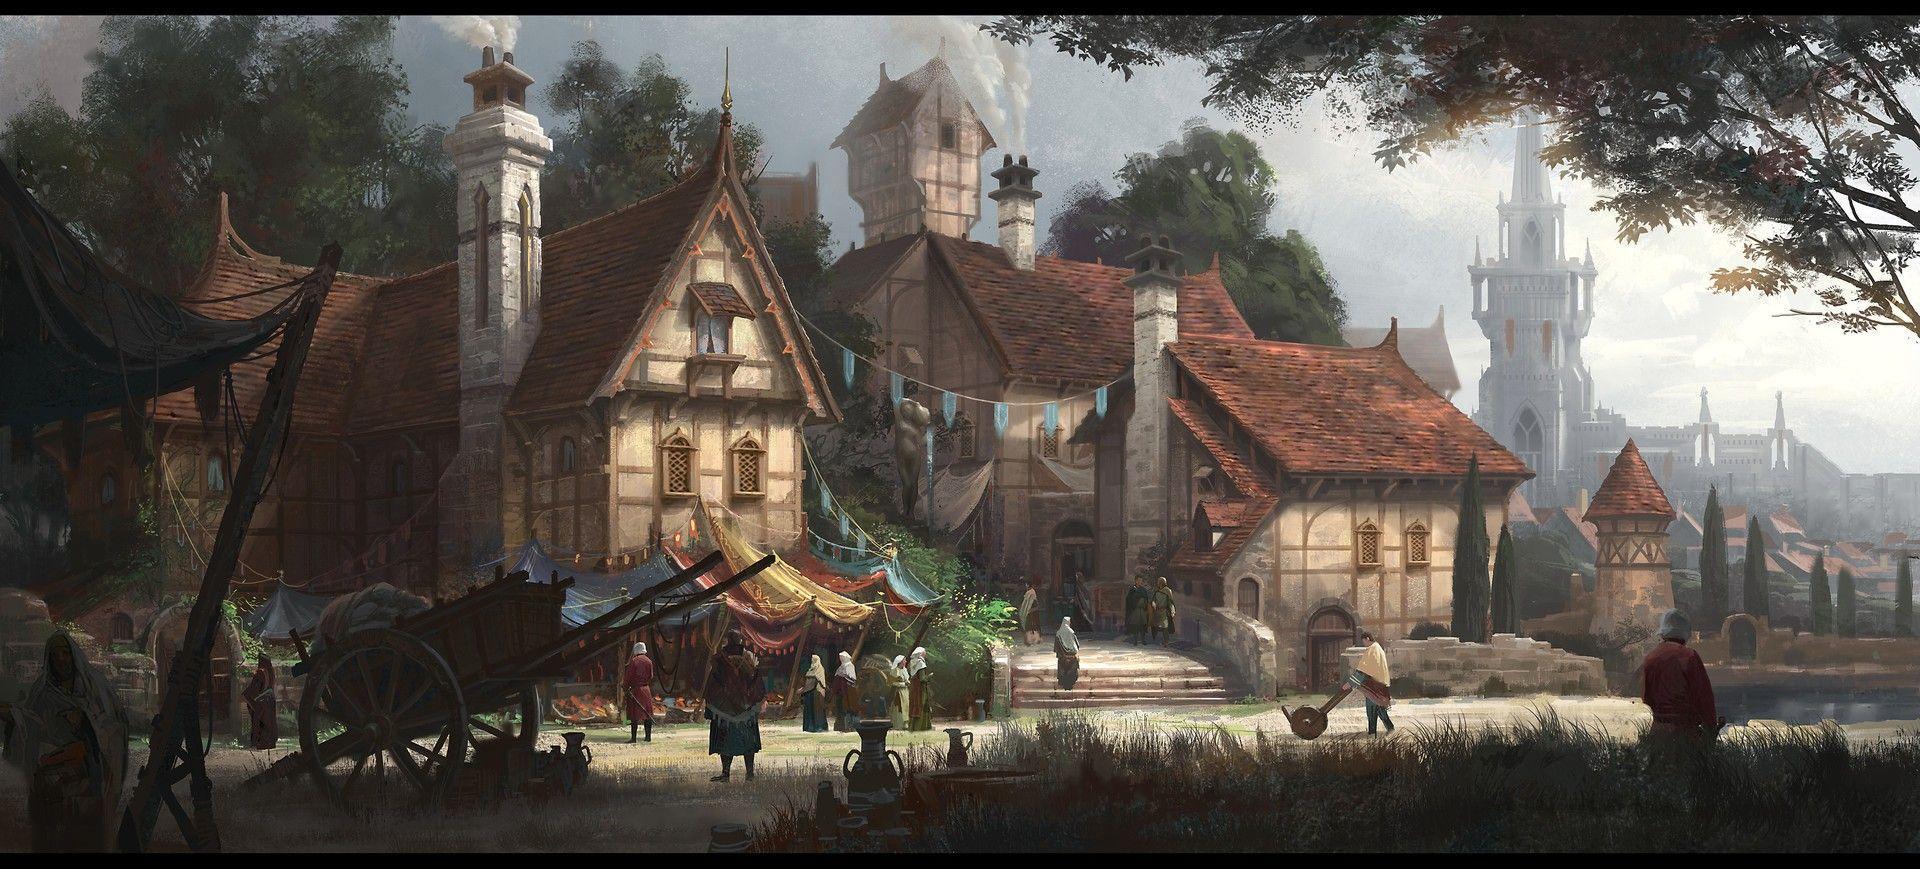 Fantasy Village Wallpapers - Top Free ...